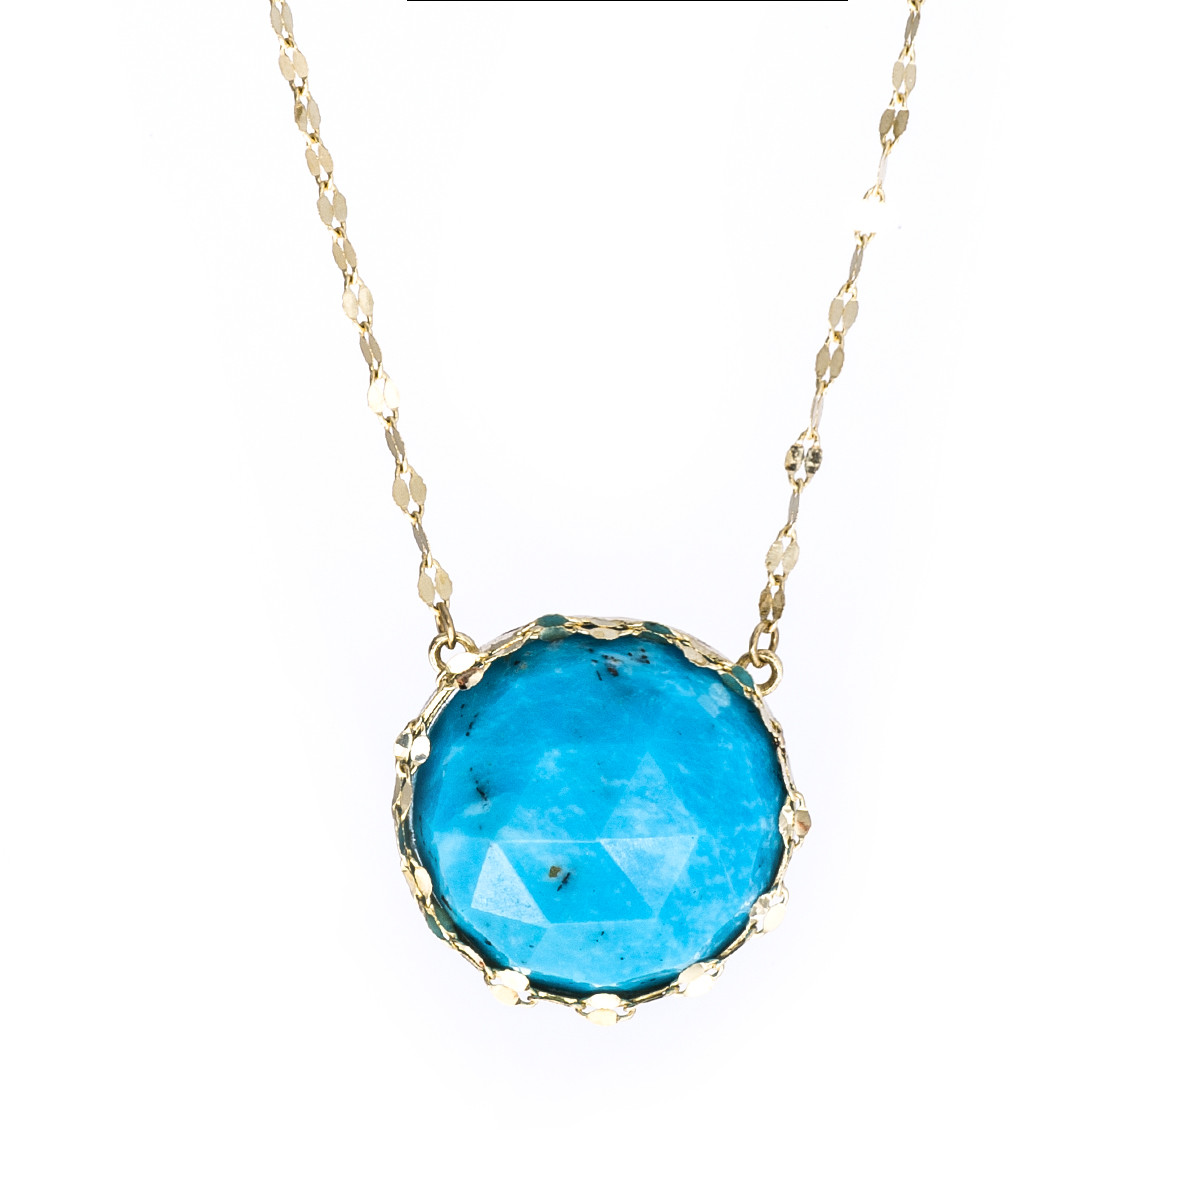 Lana Jewelry Bliss Rosecut Pendant